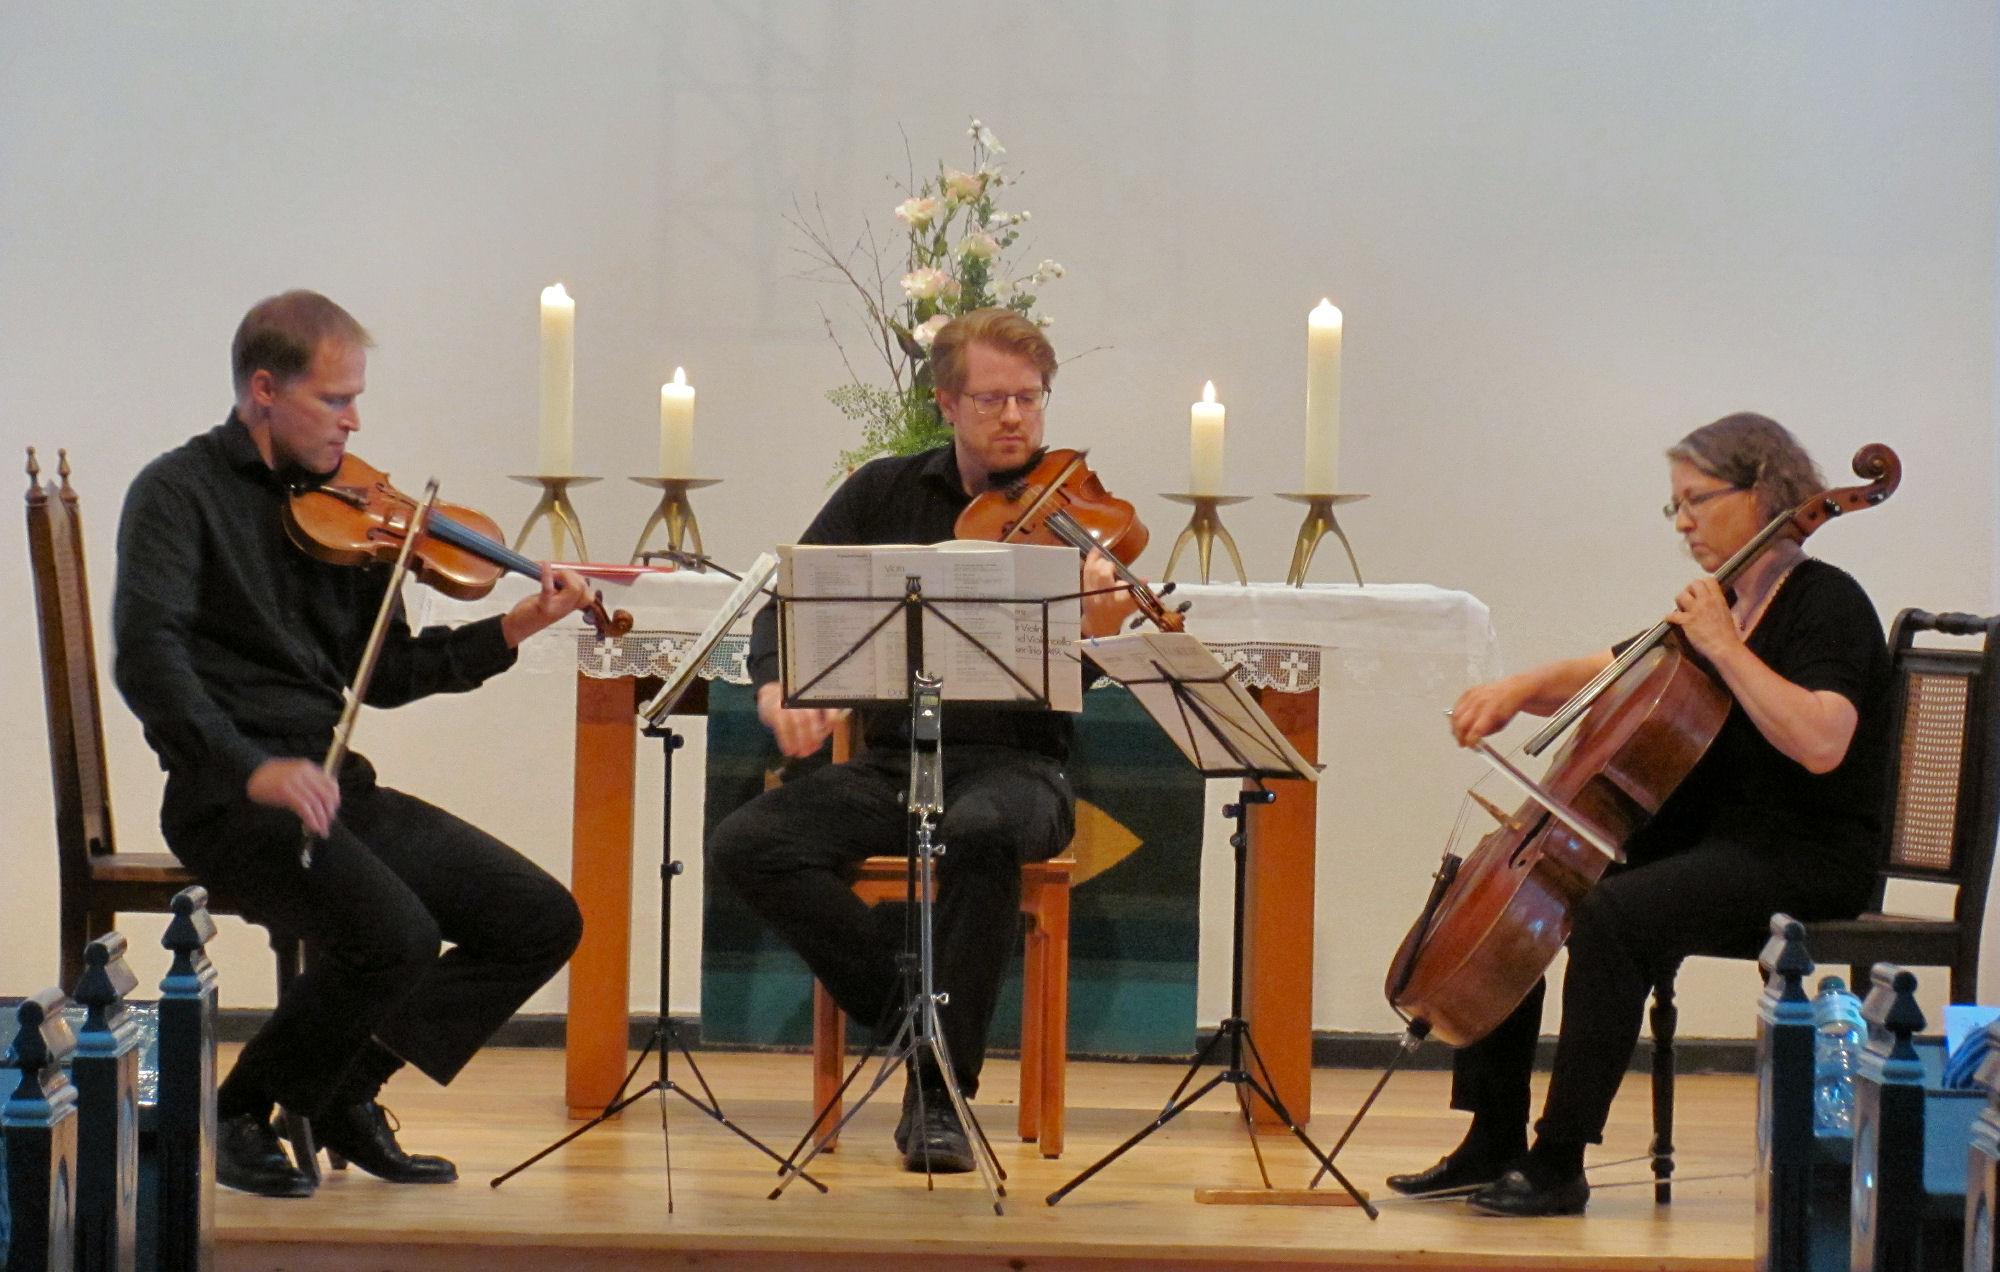 Artur-Grenz-Ensemble Kiel (Christian Gutekunst - Violine, David Grenz - Viola, Meike Hansen - Violoncello)